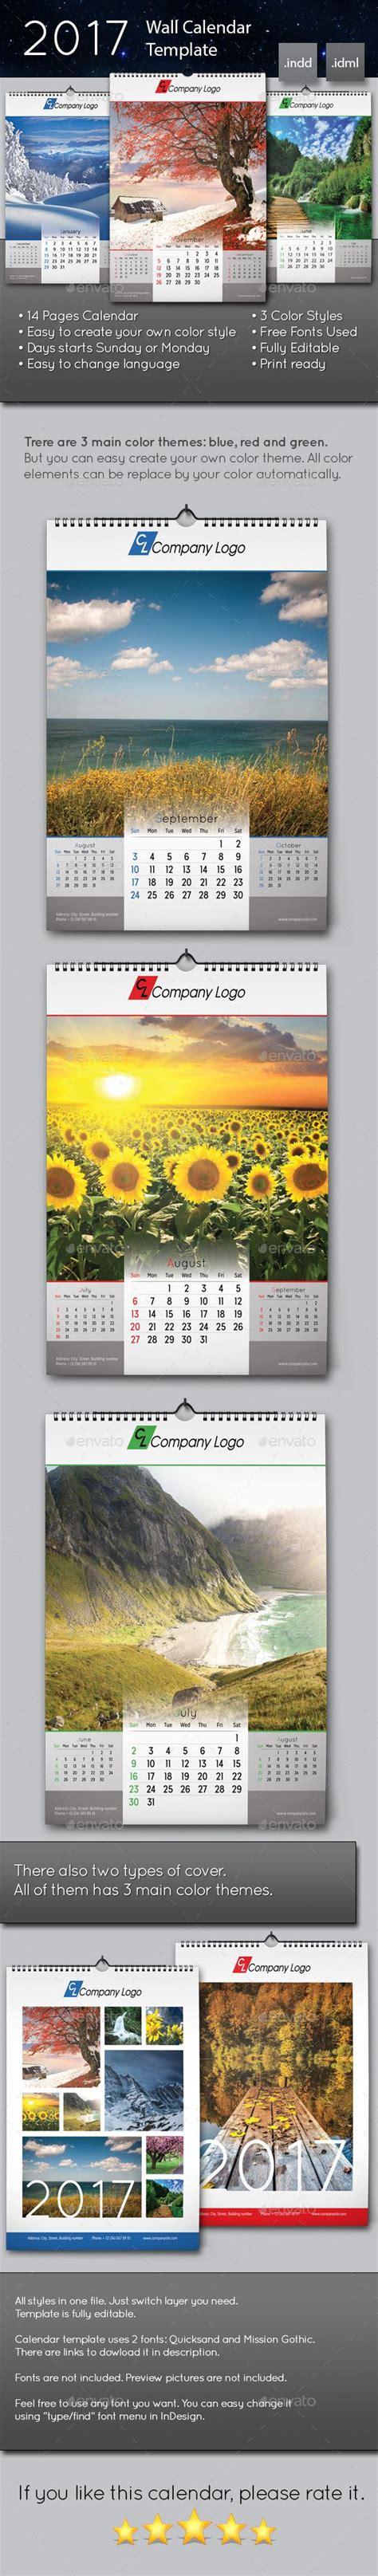 Wall Calendar Template Indesign 1000 Ideas About Calendar Templates On